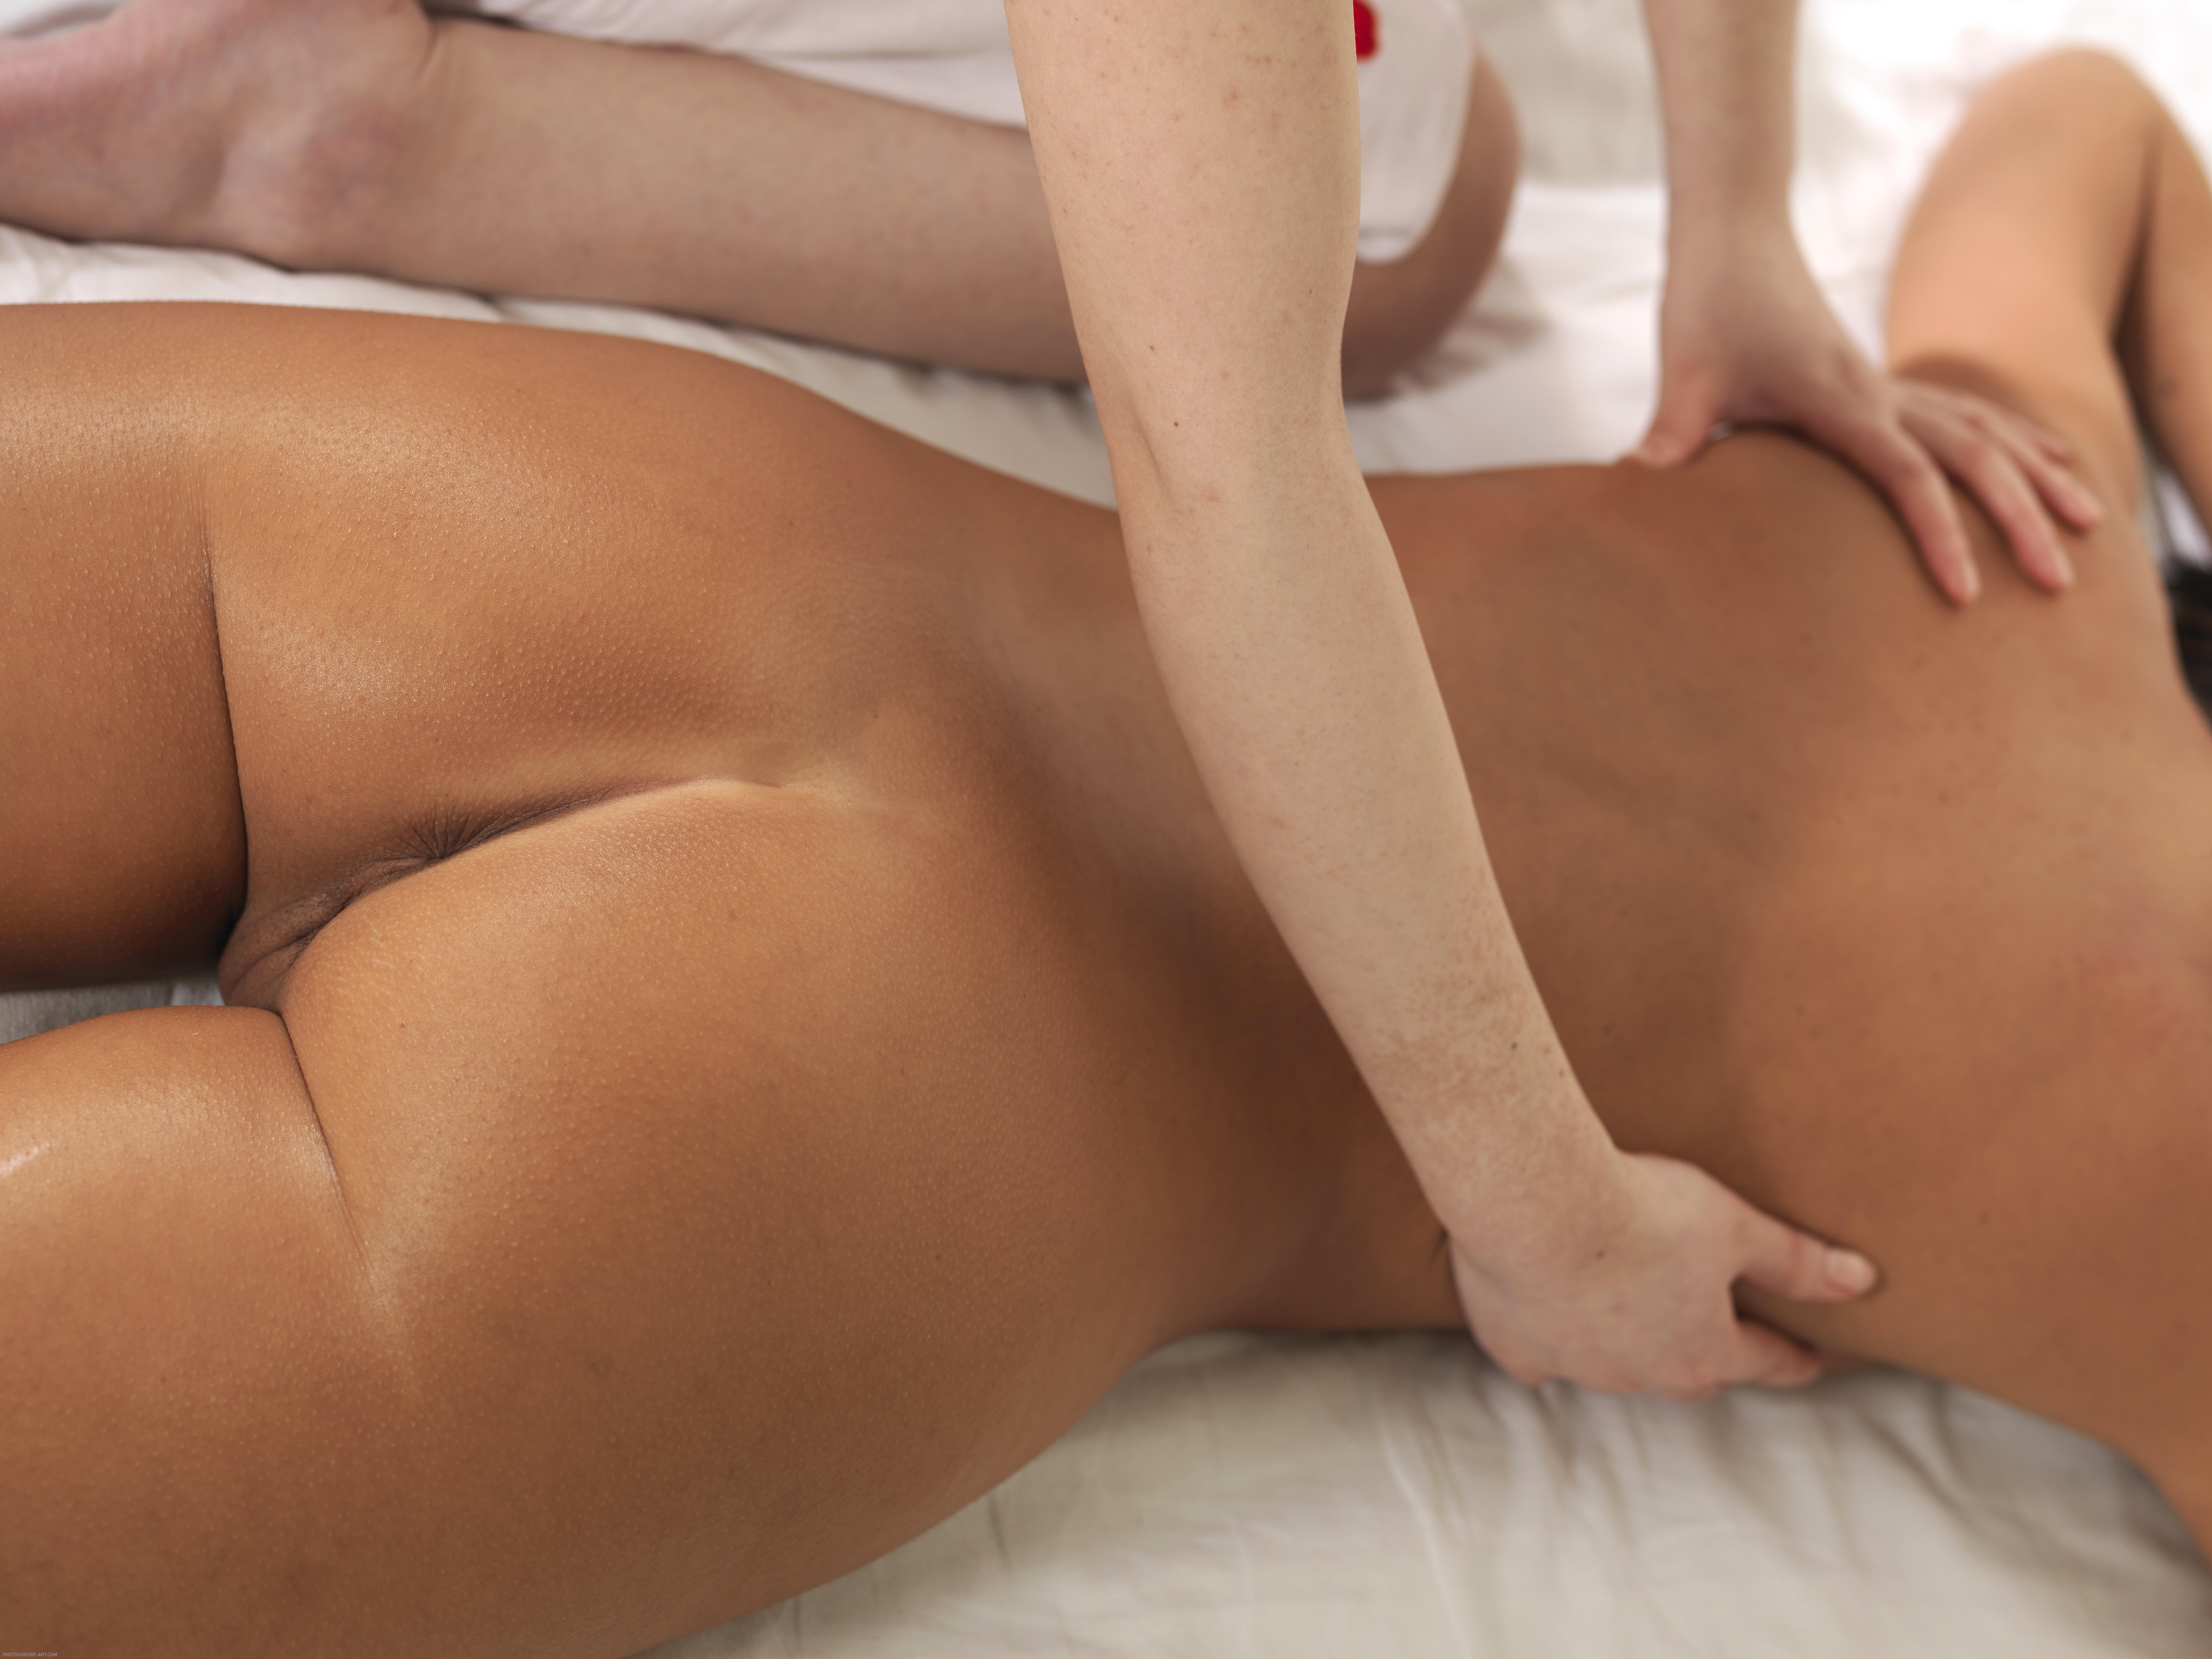 italian sensual massage deilig deiligere deiligst